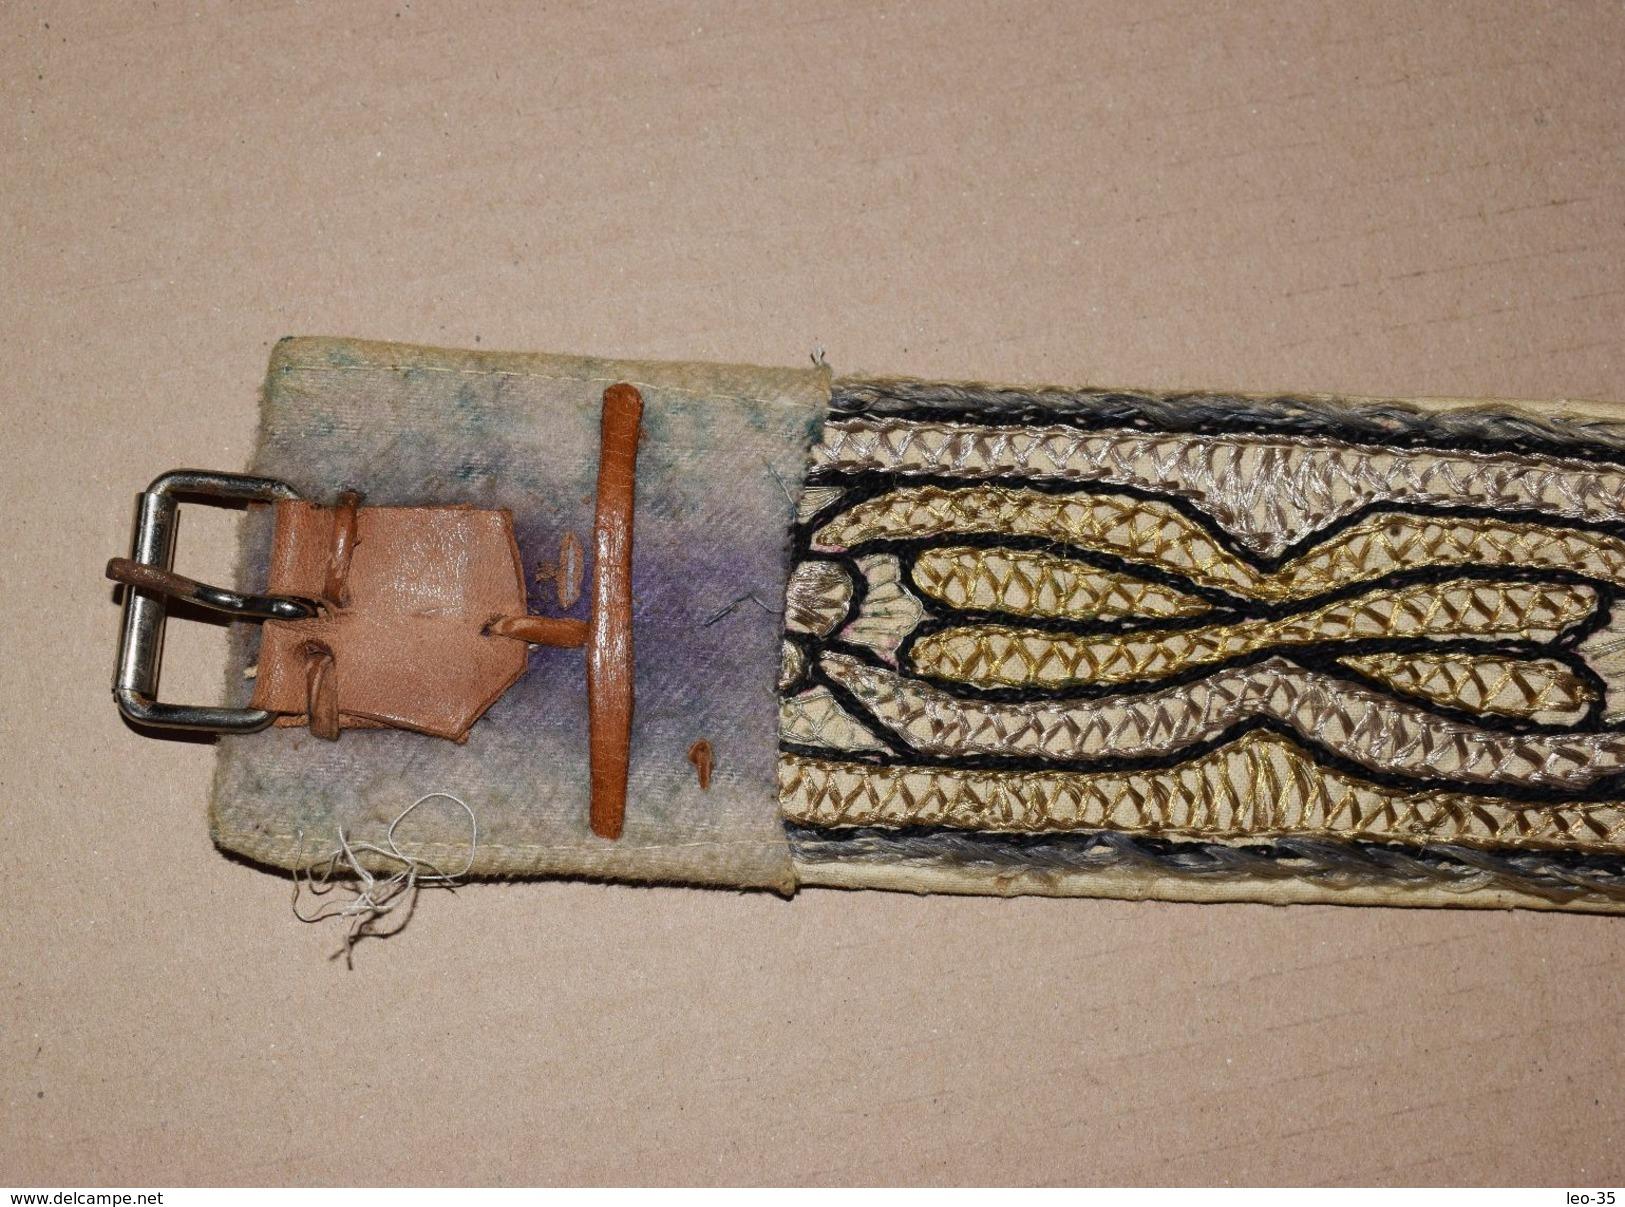 Couteau Ancien Jambiya Avec Ceinture  - Poignard Janbiya Du YEMEN - Knives/Swords